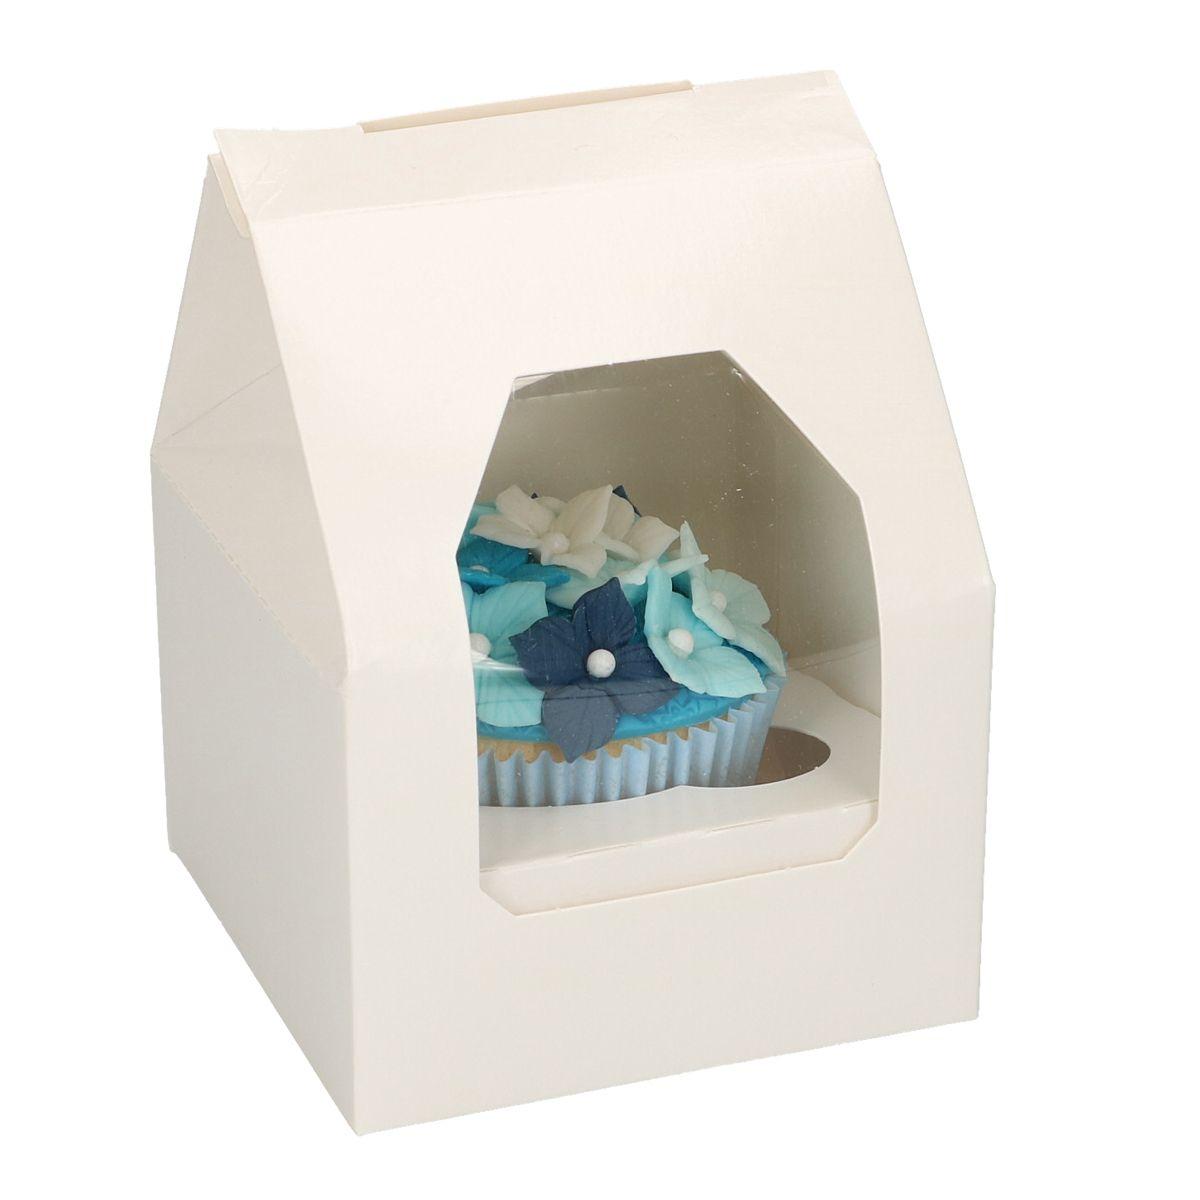 Boîte pour 1 cupcake - Blanc - Lot de 3